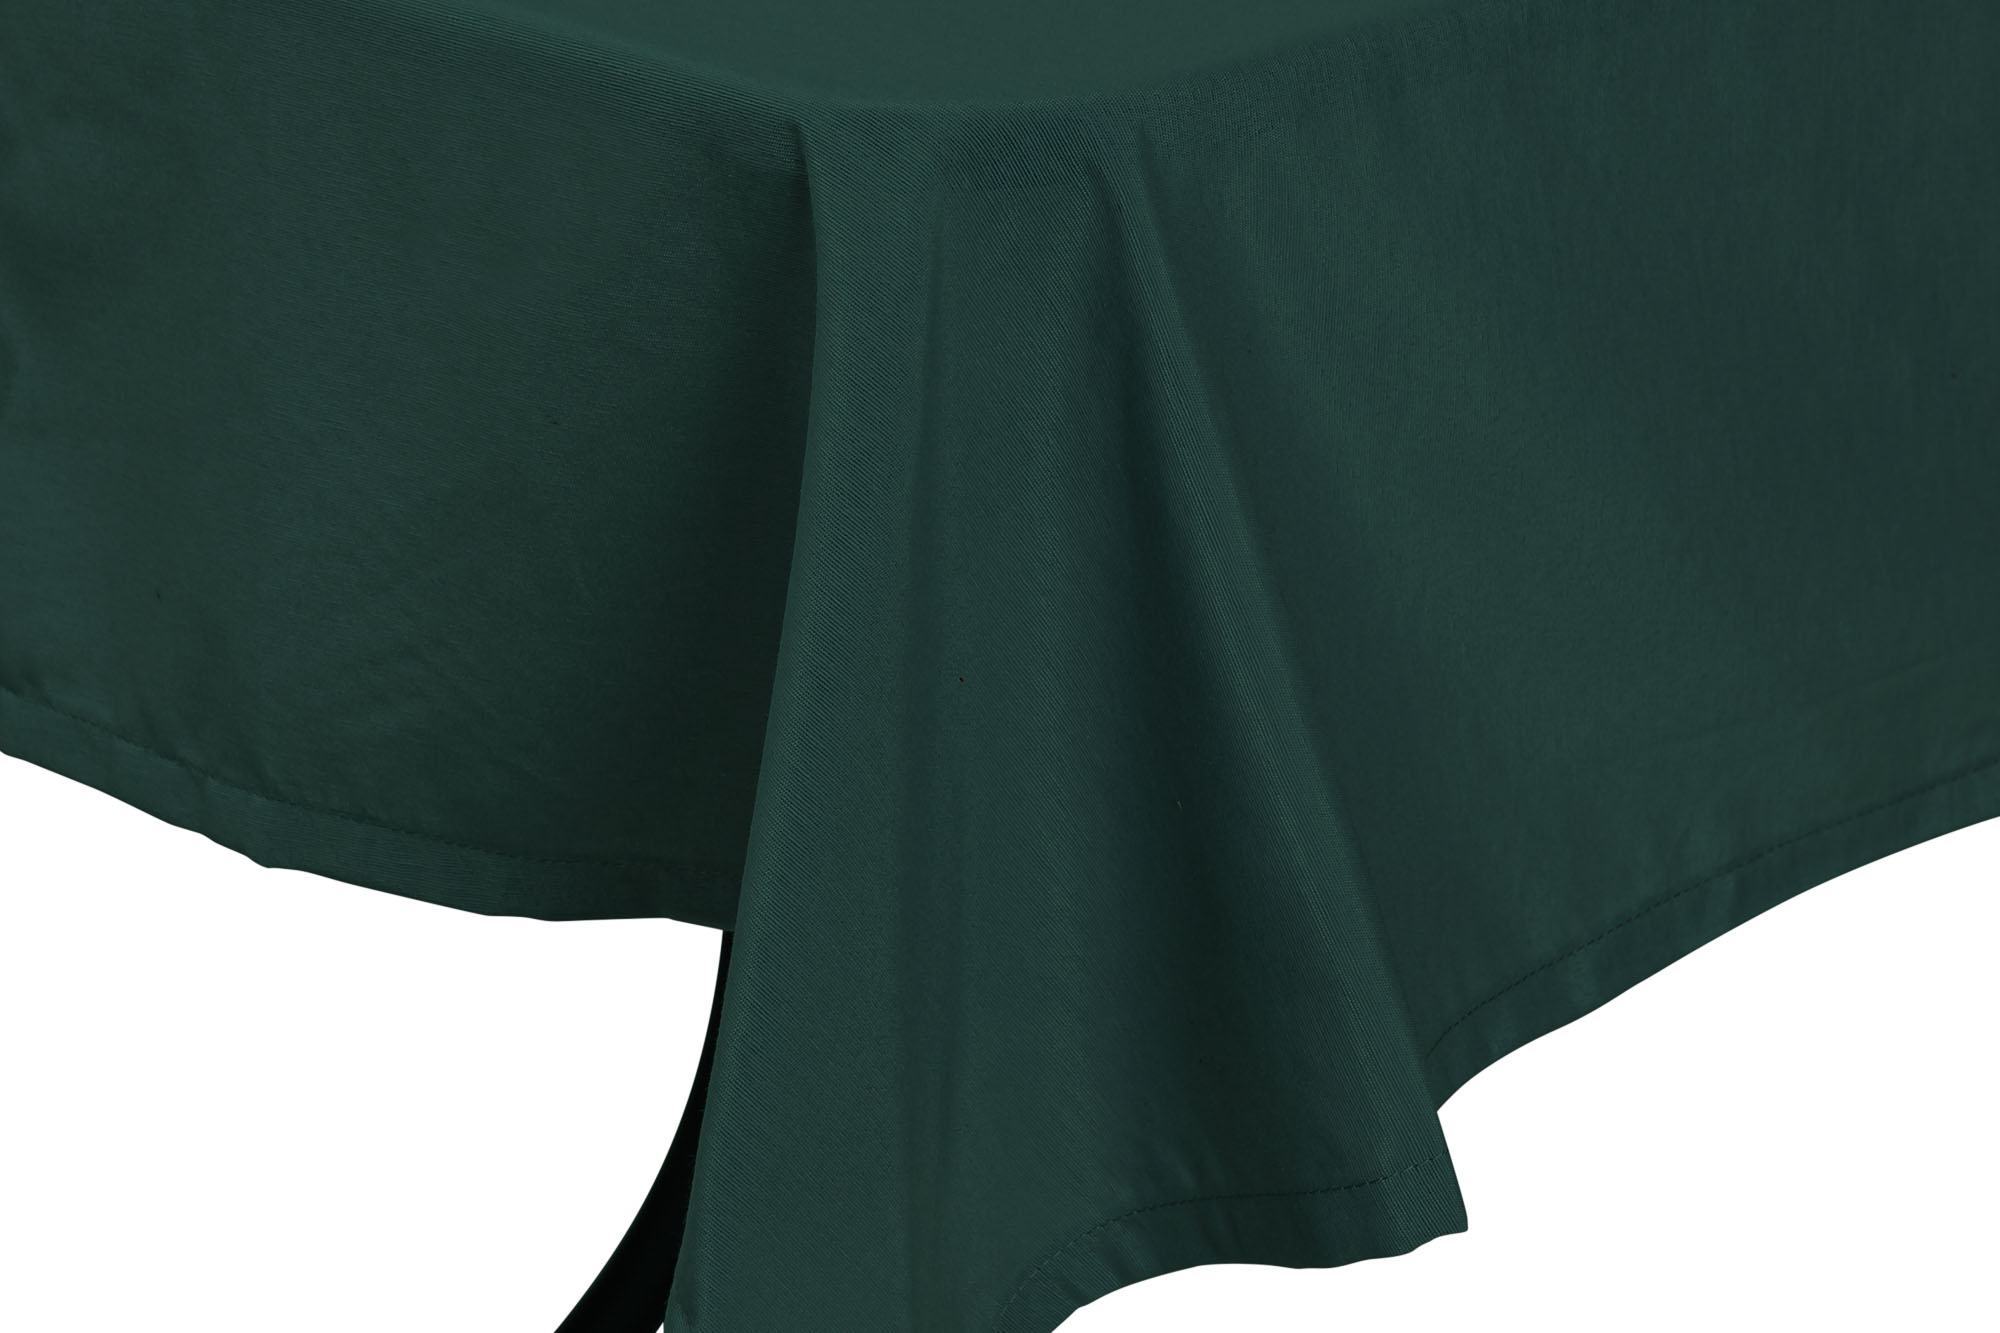 Tischdecke 140x180 cm dunkelgrün 2147